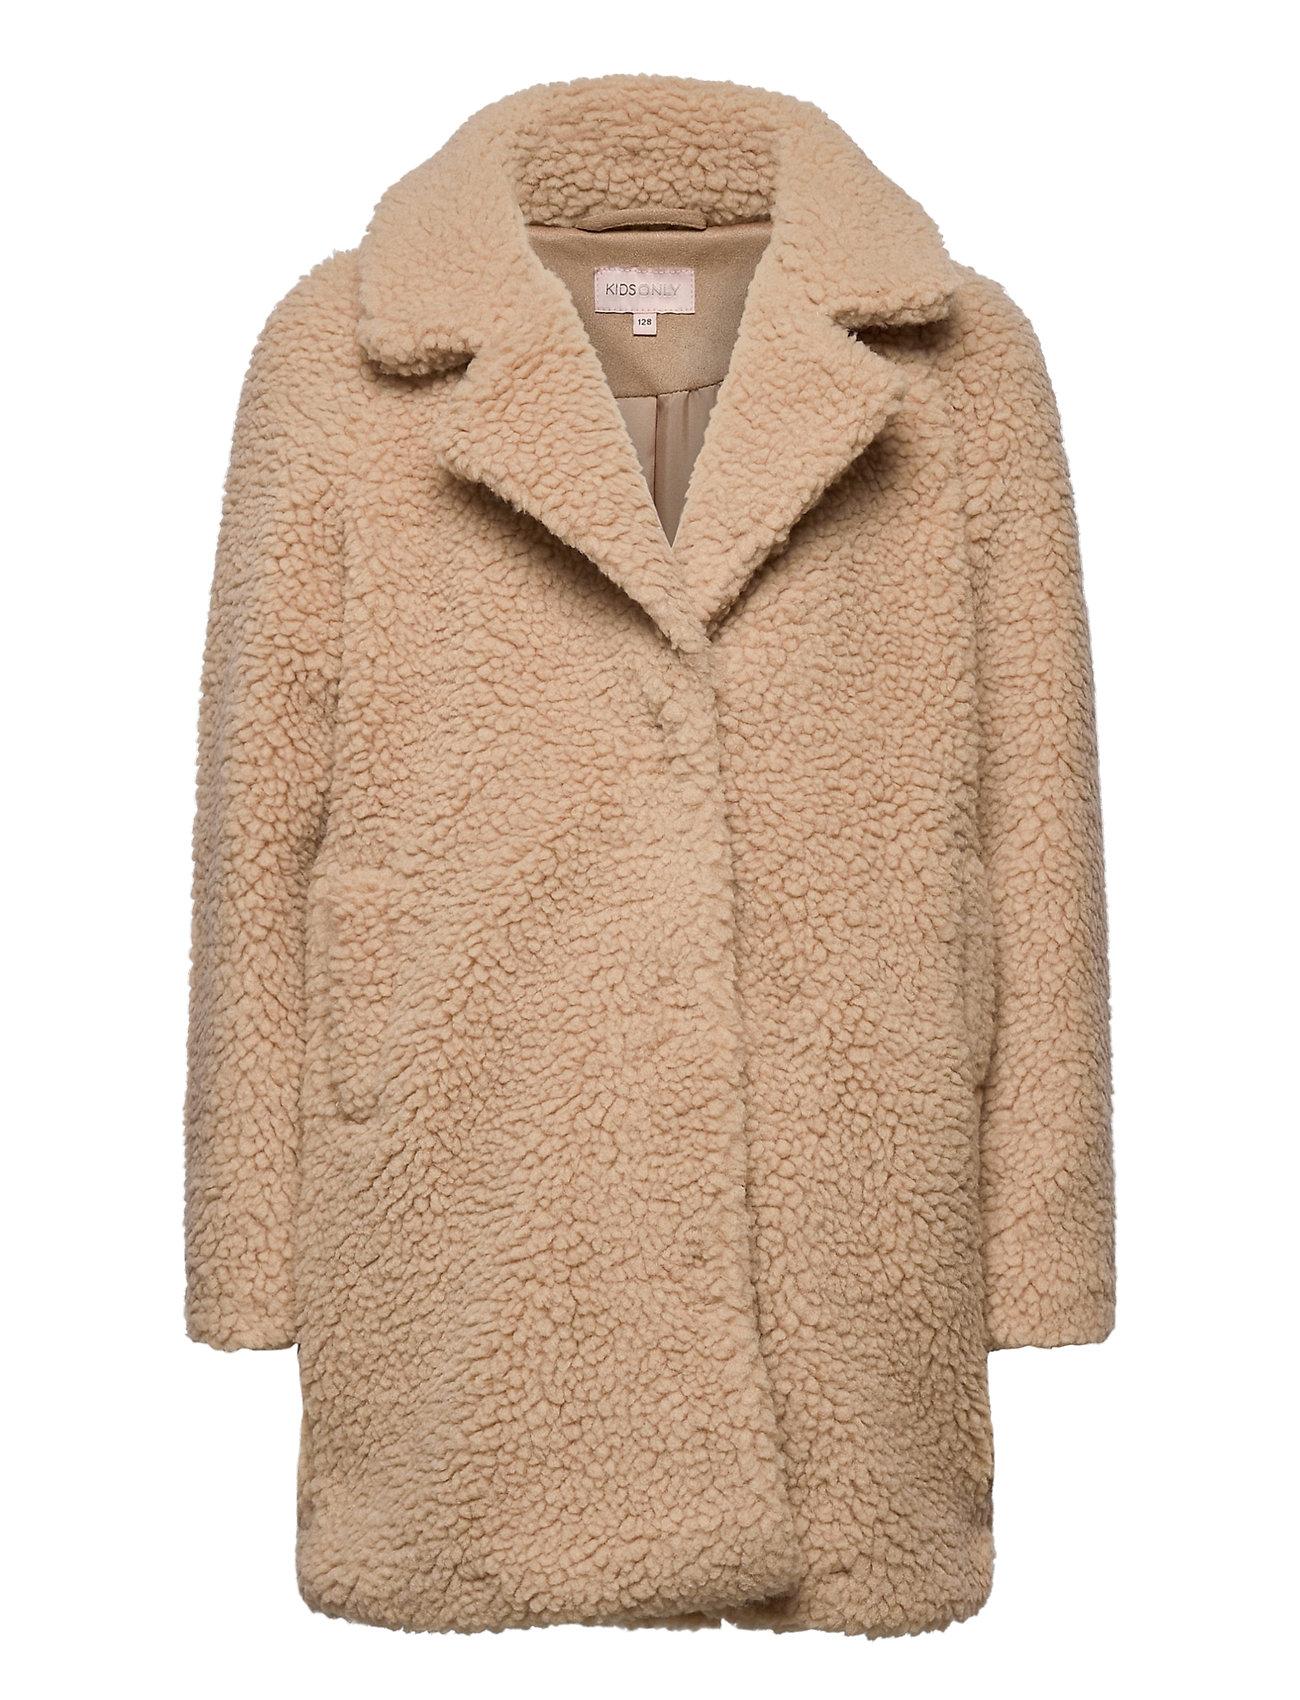 Image of Konnewaurelia Sherpaa Coat Cp Otw Outerwear Wool Outerwear Brun Kids Only (3441399681)